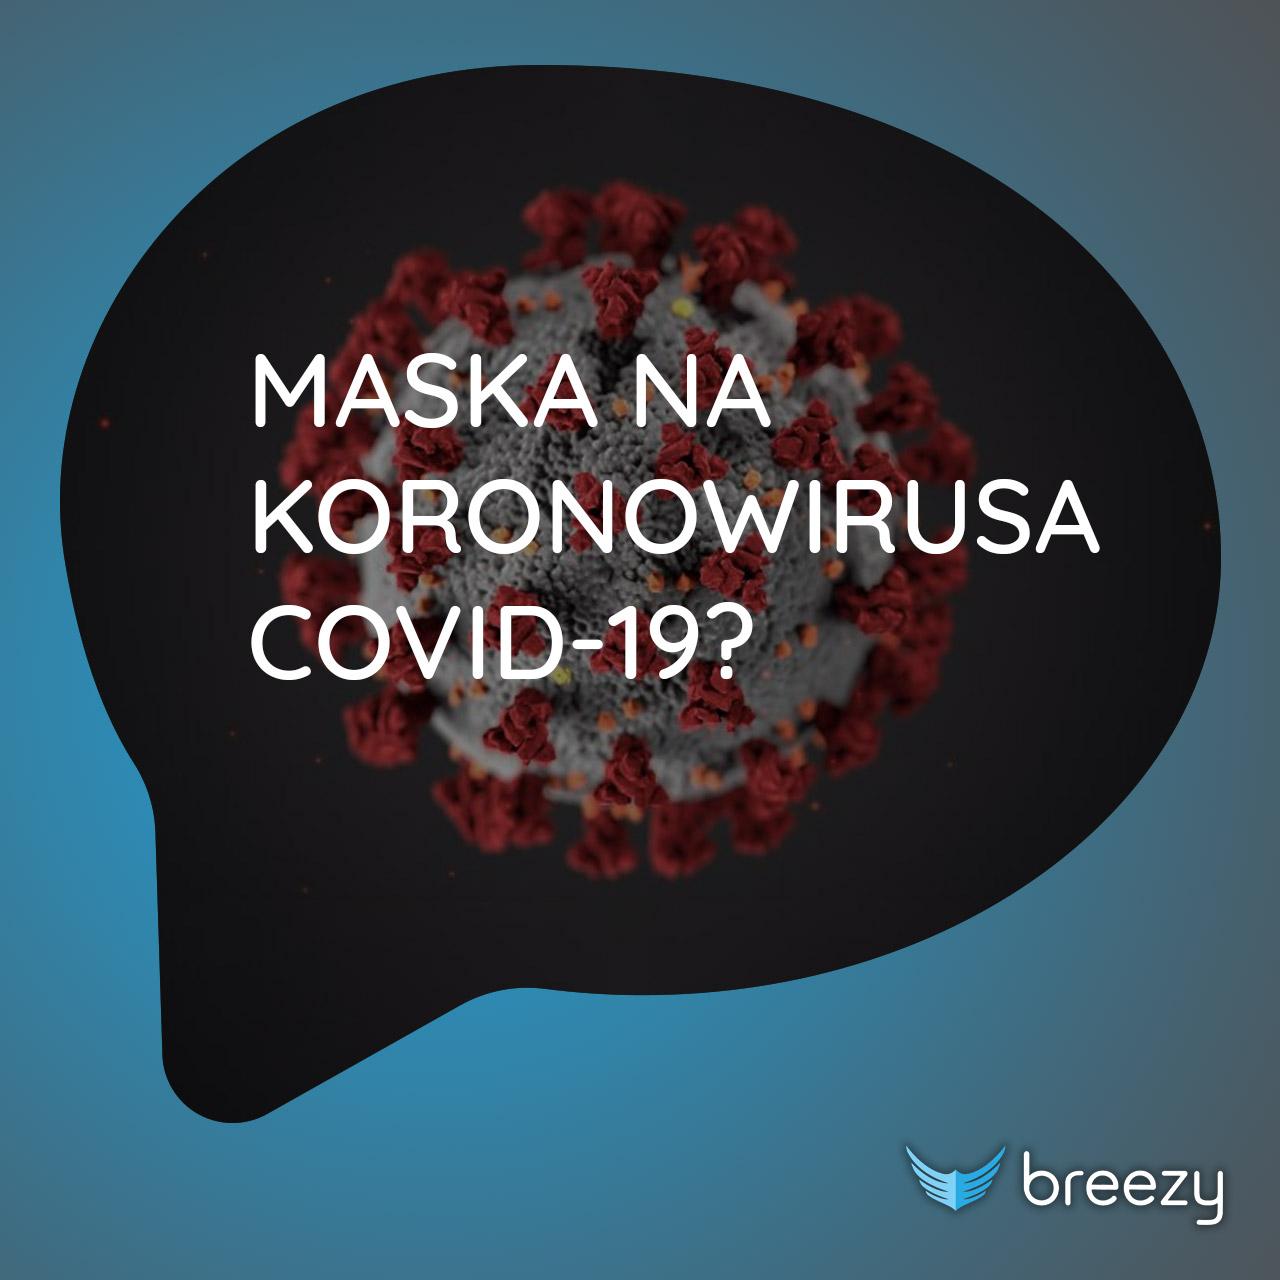 Maska na koronowirusa COVID-19